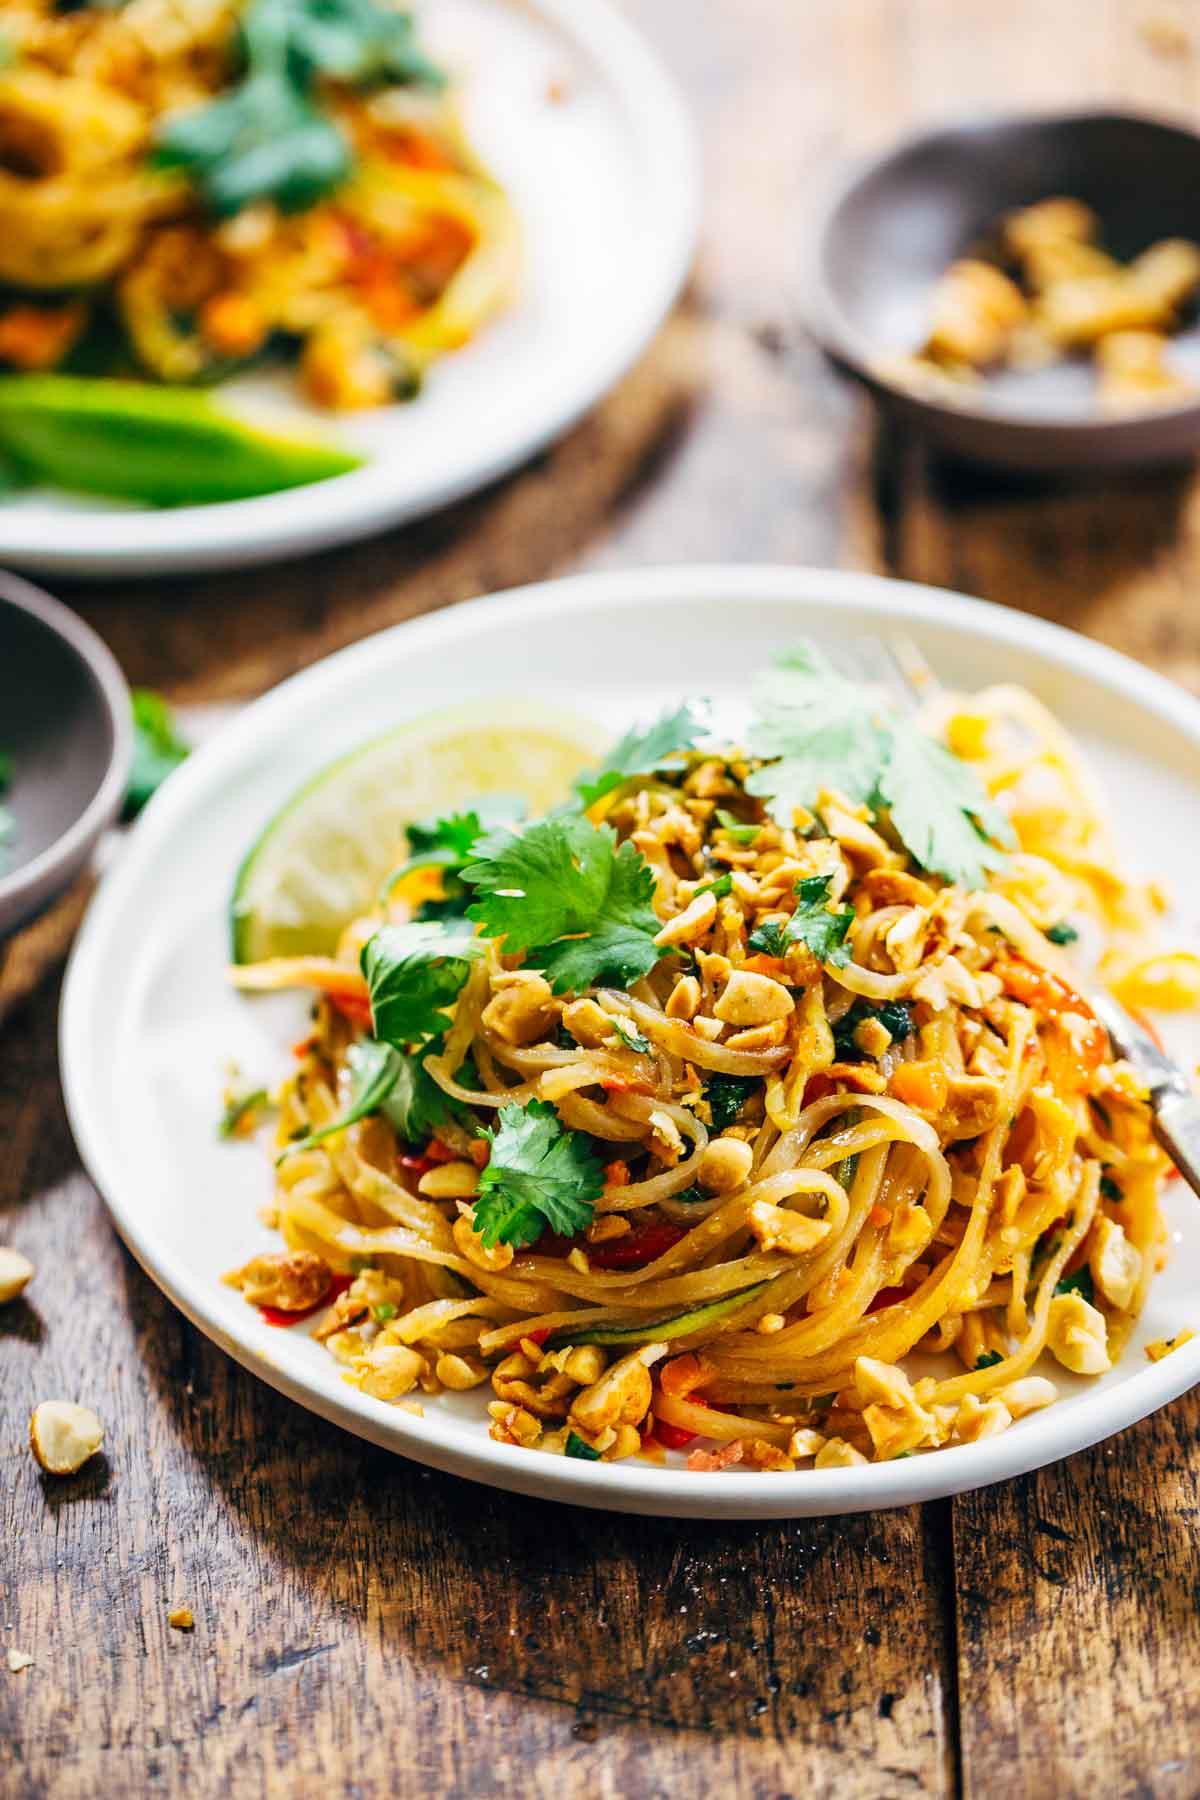 Vegan Rice Noodle Recipes  Rainbow Ve arian Pad Thai with Peanuts and Basil Recipe